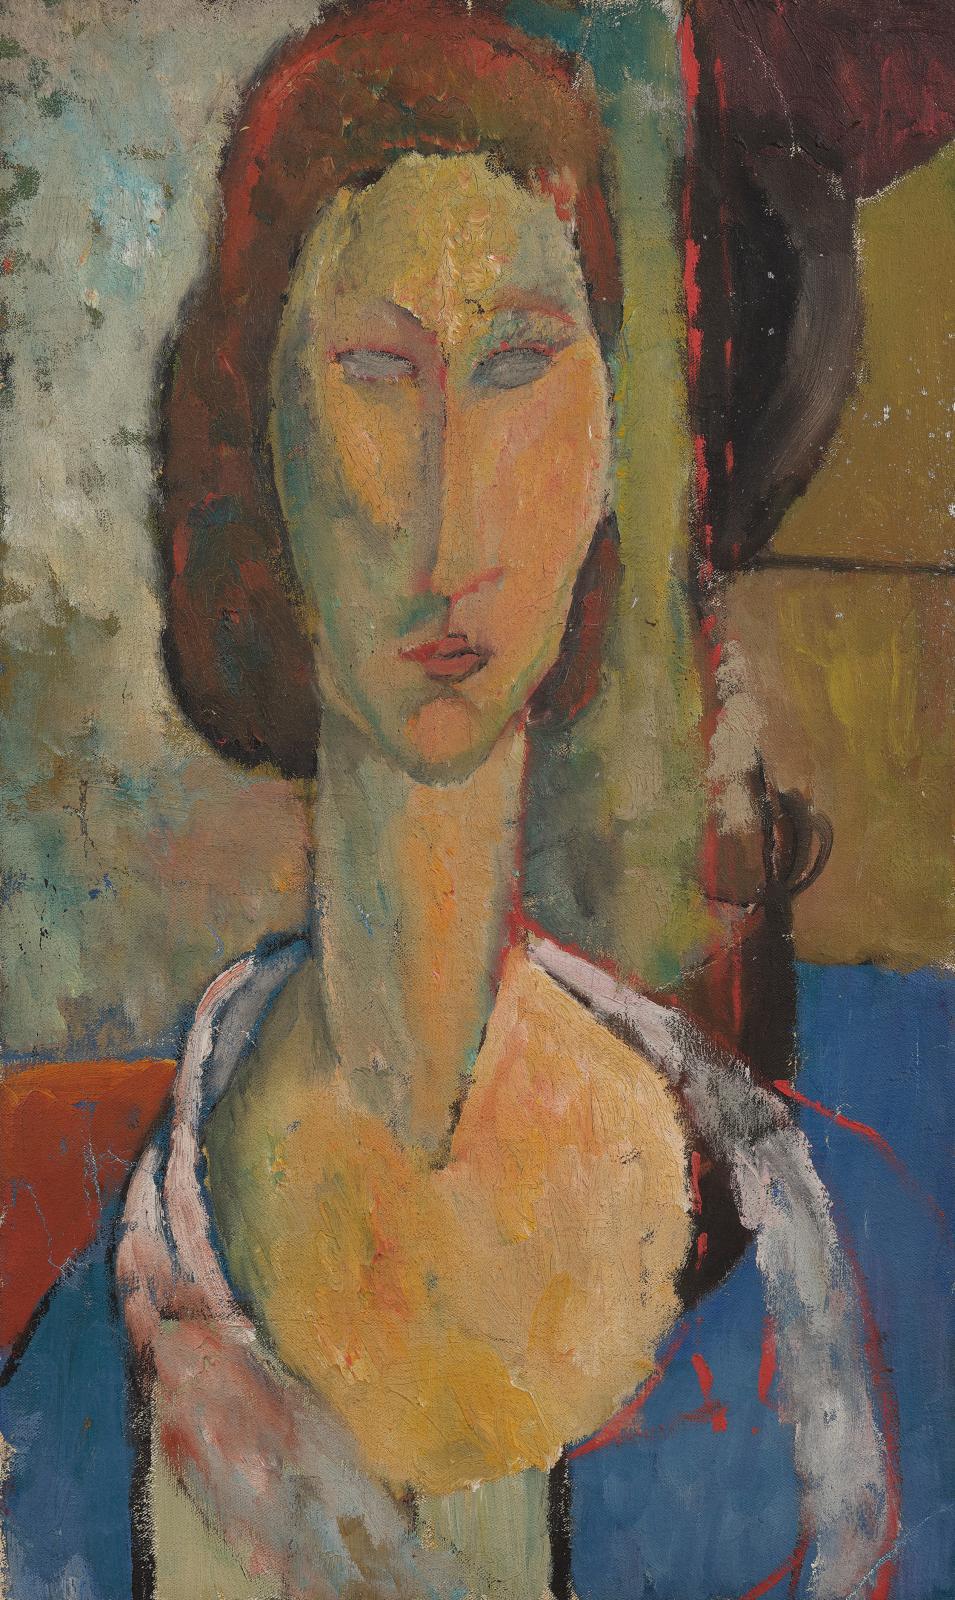 Jeanne Hébuterne (1898-1920), Selfportrait, oil on canvas, 55 x 33 cm (detail), 1.8 x 1 ft.Result: €188,500